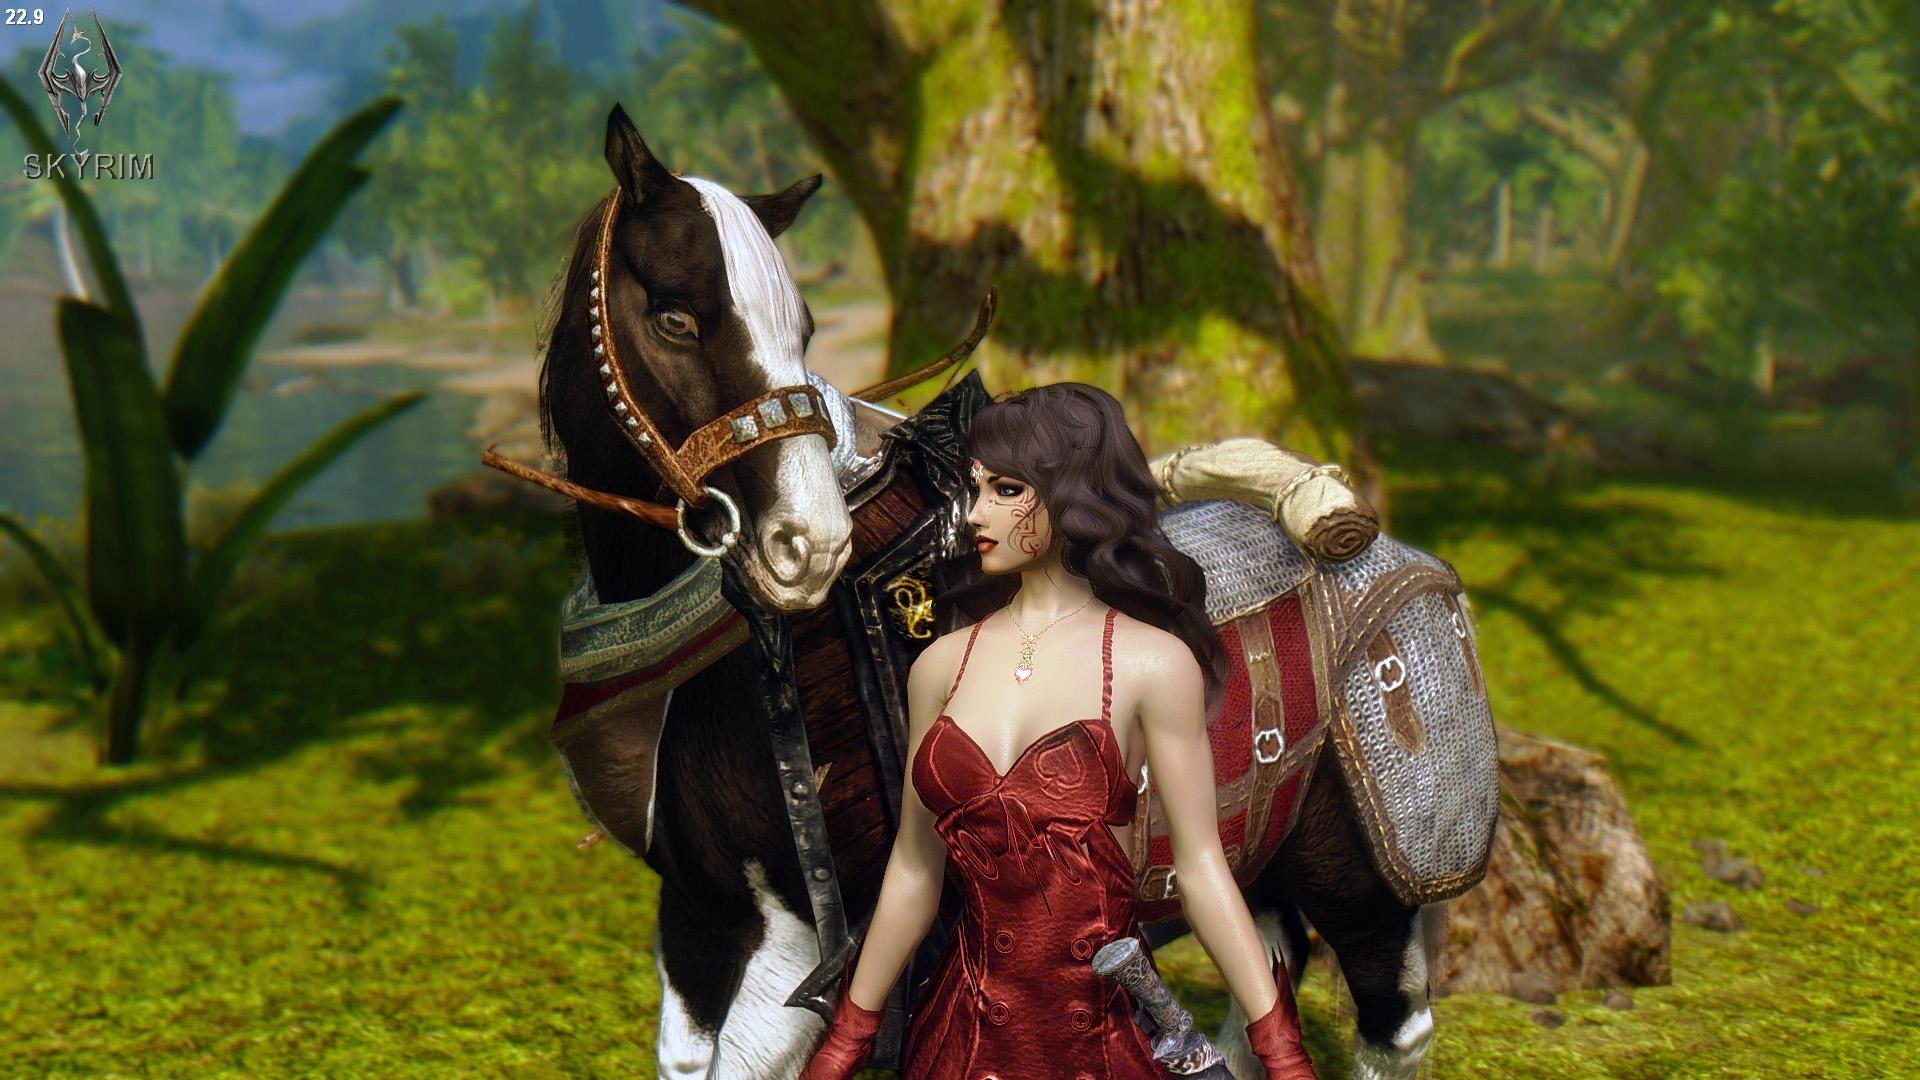 018. Алисса, поехали!.jpg - Elder Scrolls 5: Skyrim, the CBBE, Сборка-21